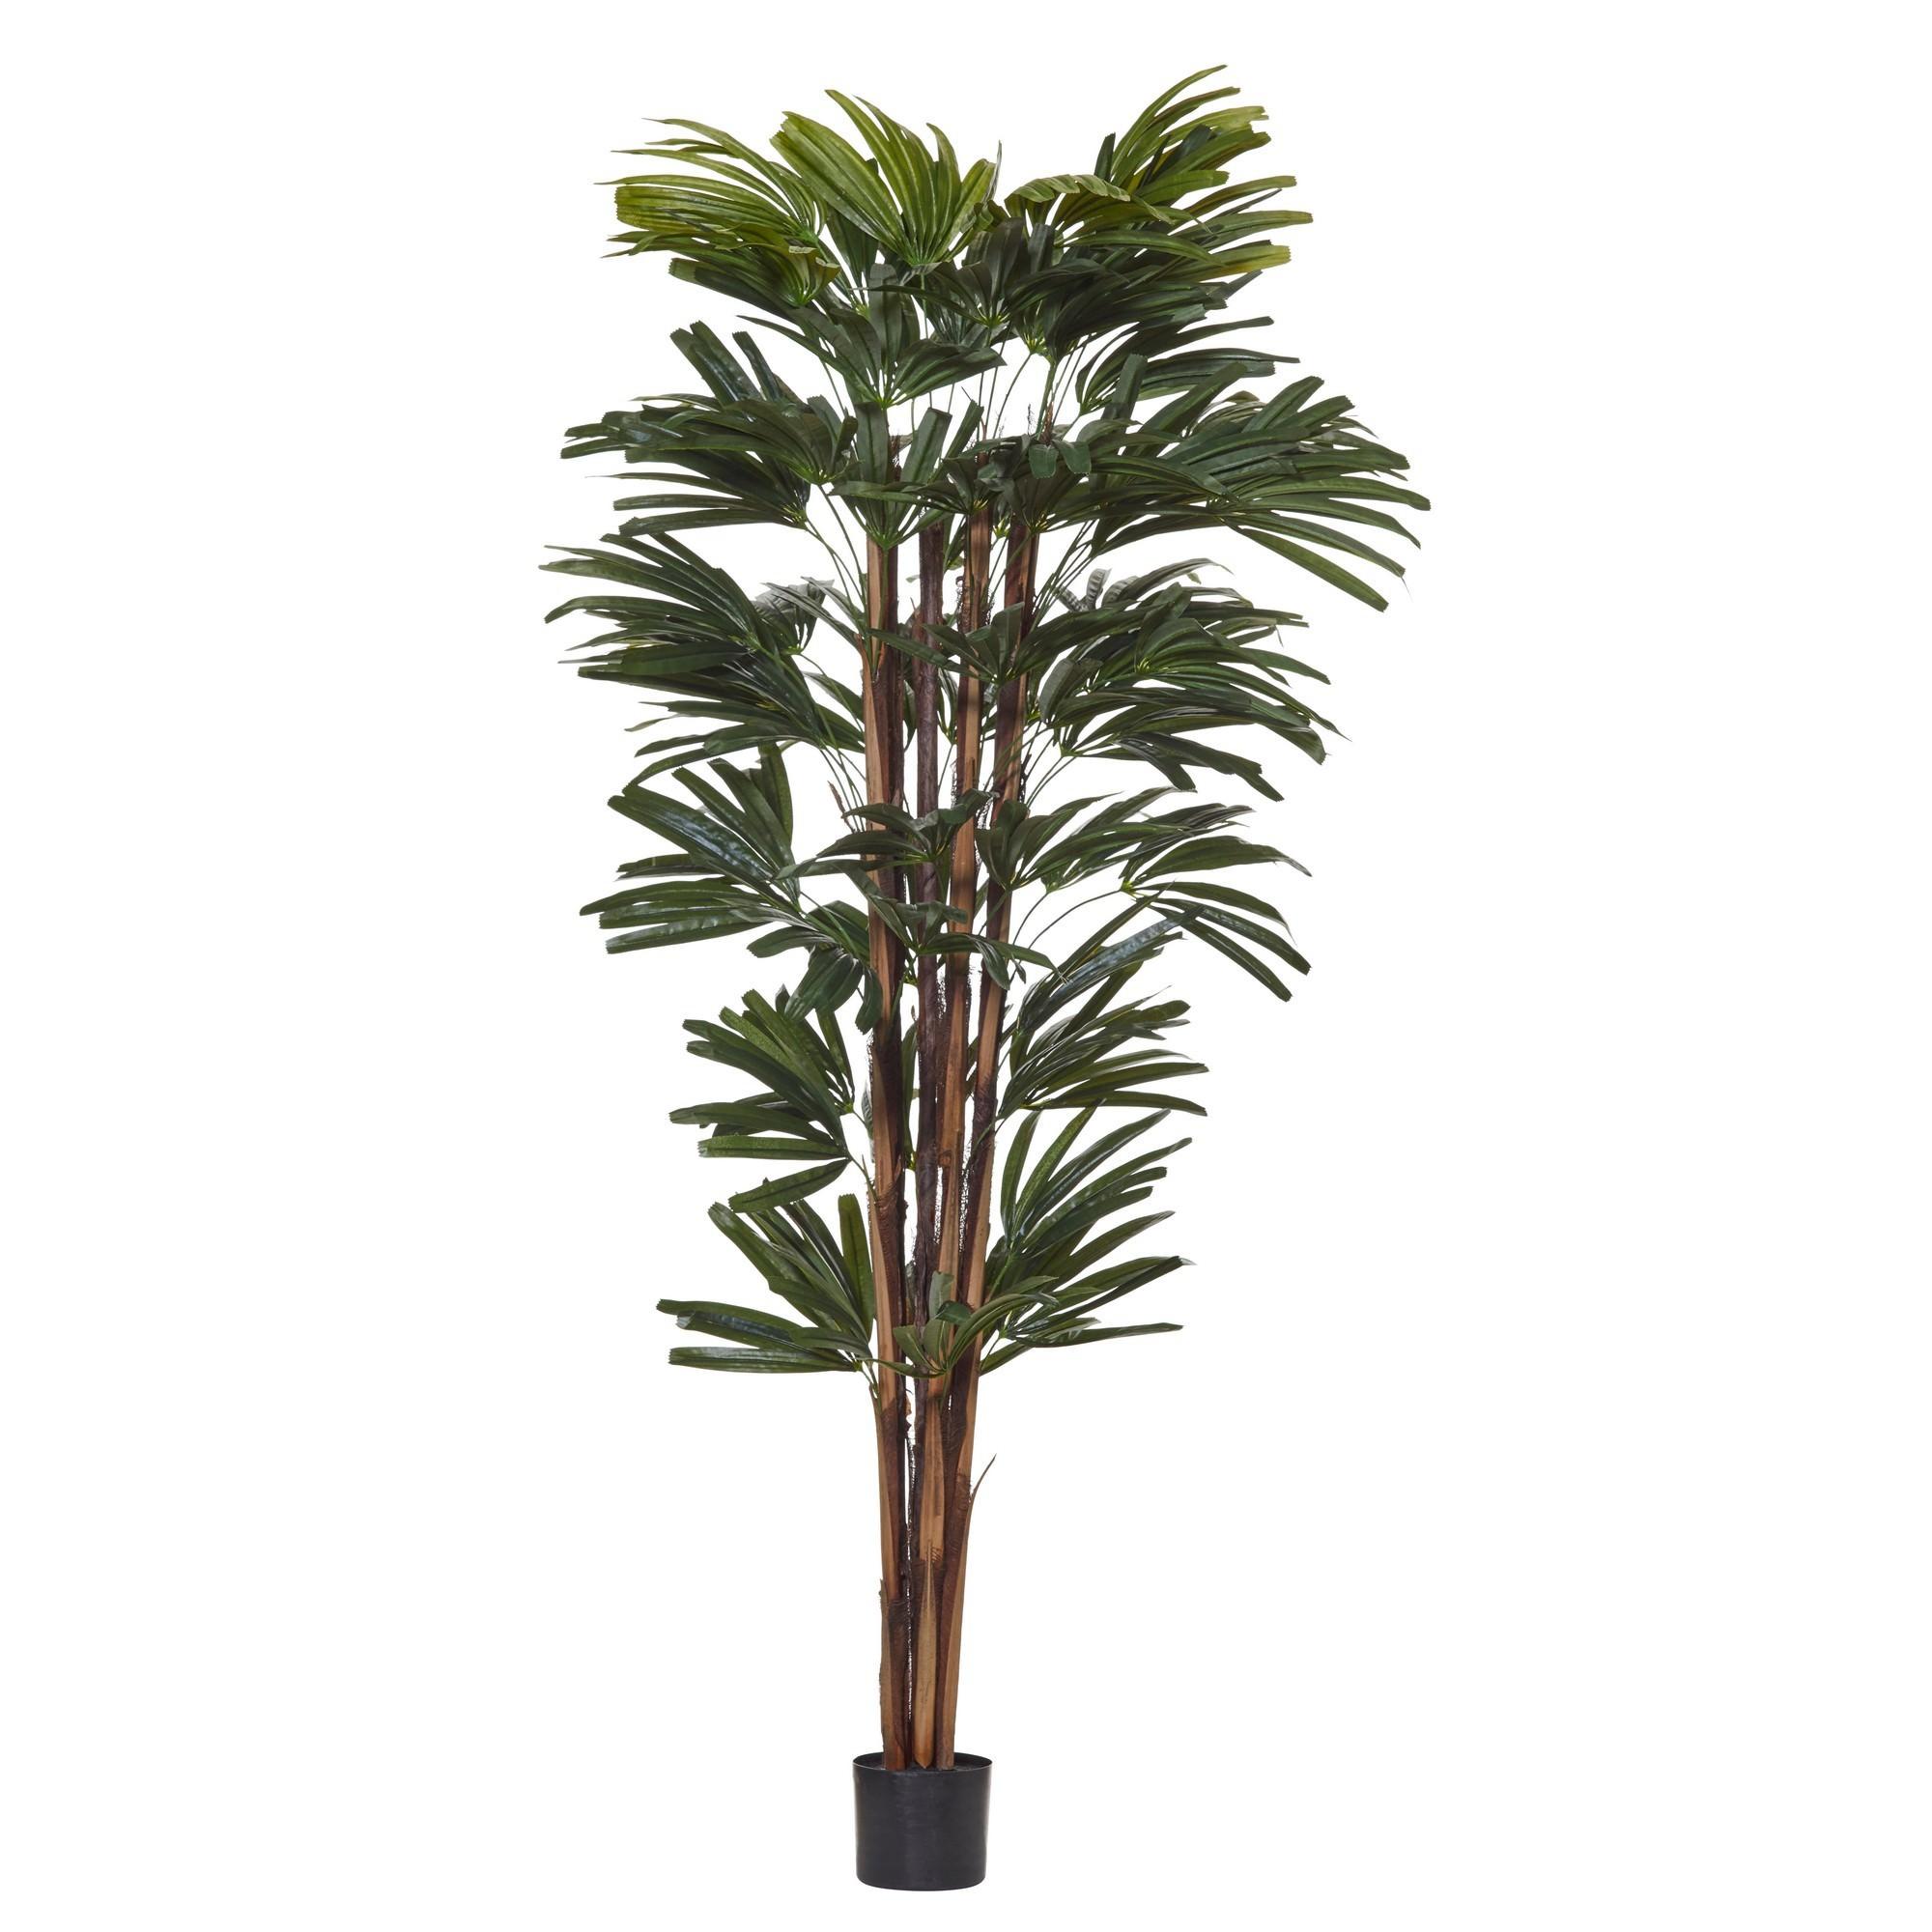 Potted Artificial Rhapis Palm Tree, 180cm